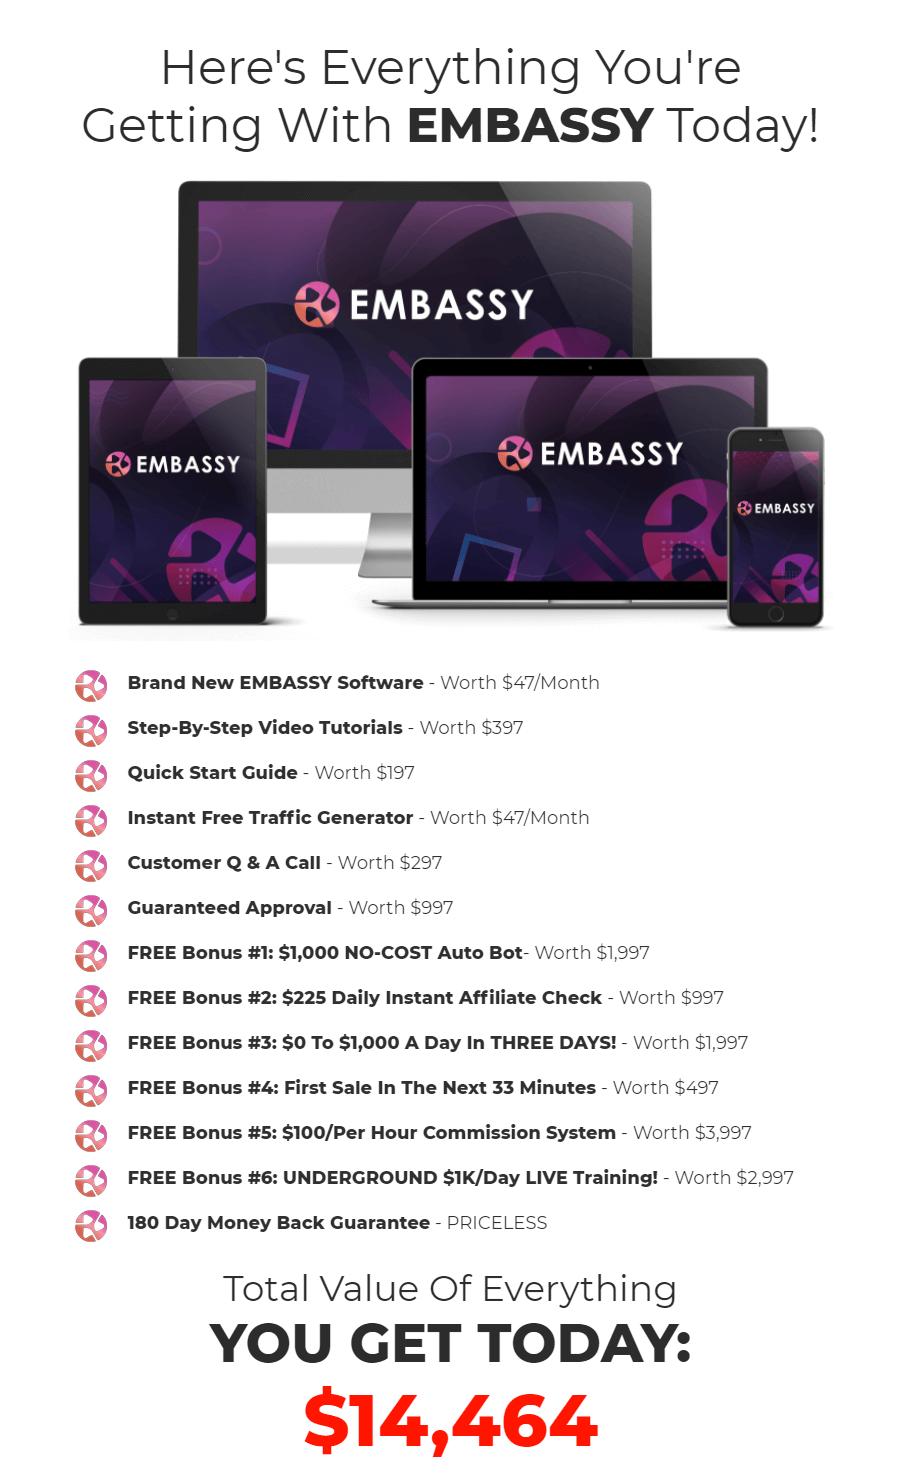 Embassy-Recap